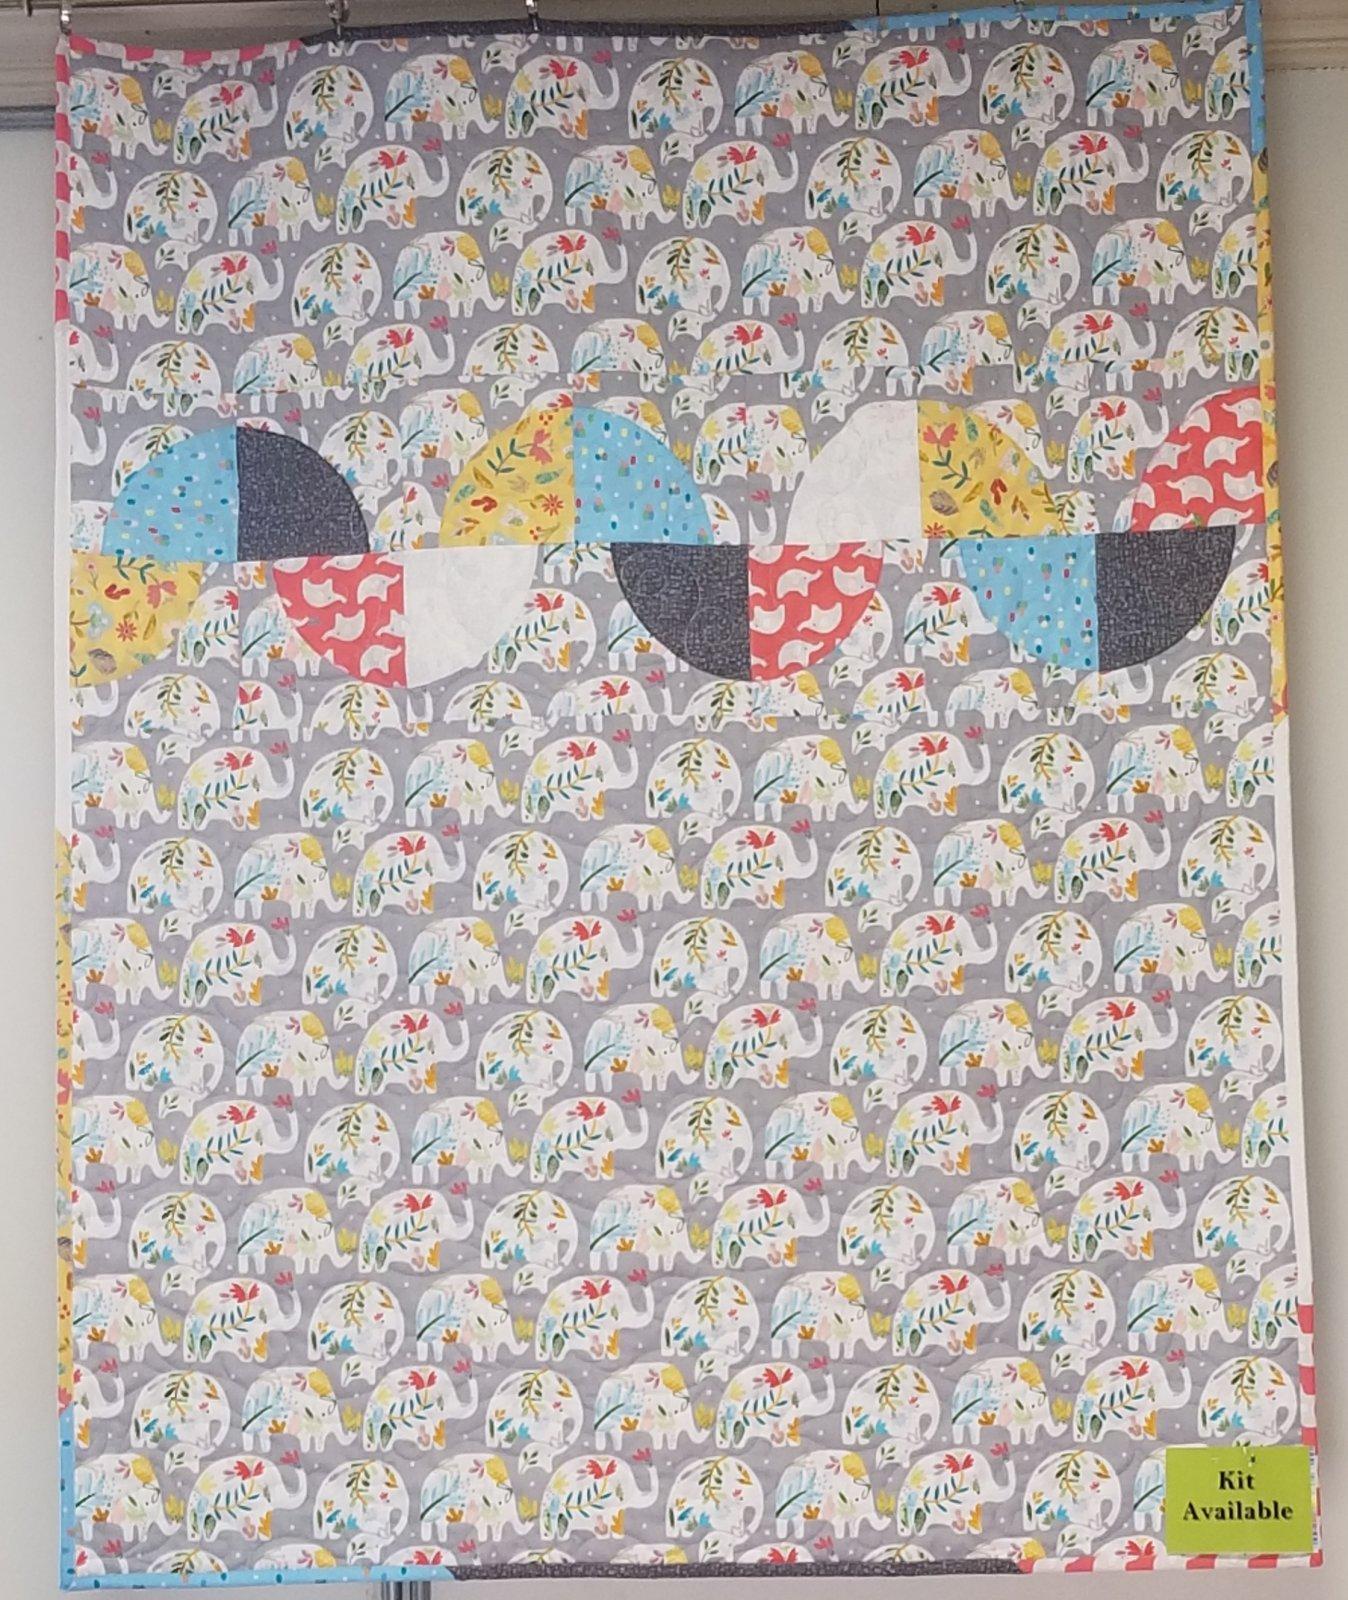 Ellie the Elephant Triplets Fabric Kit